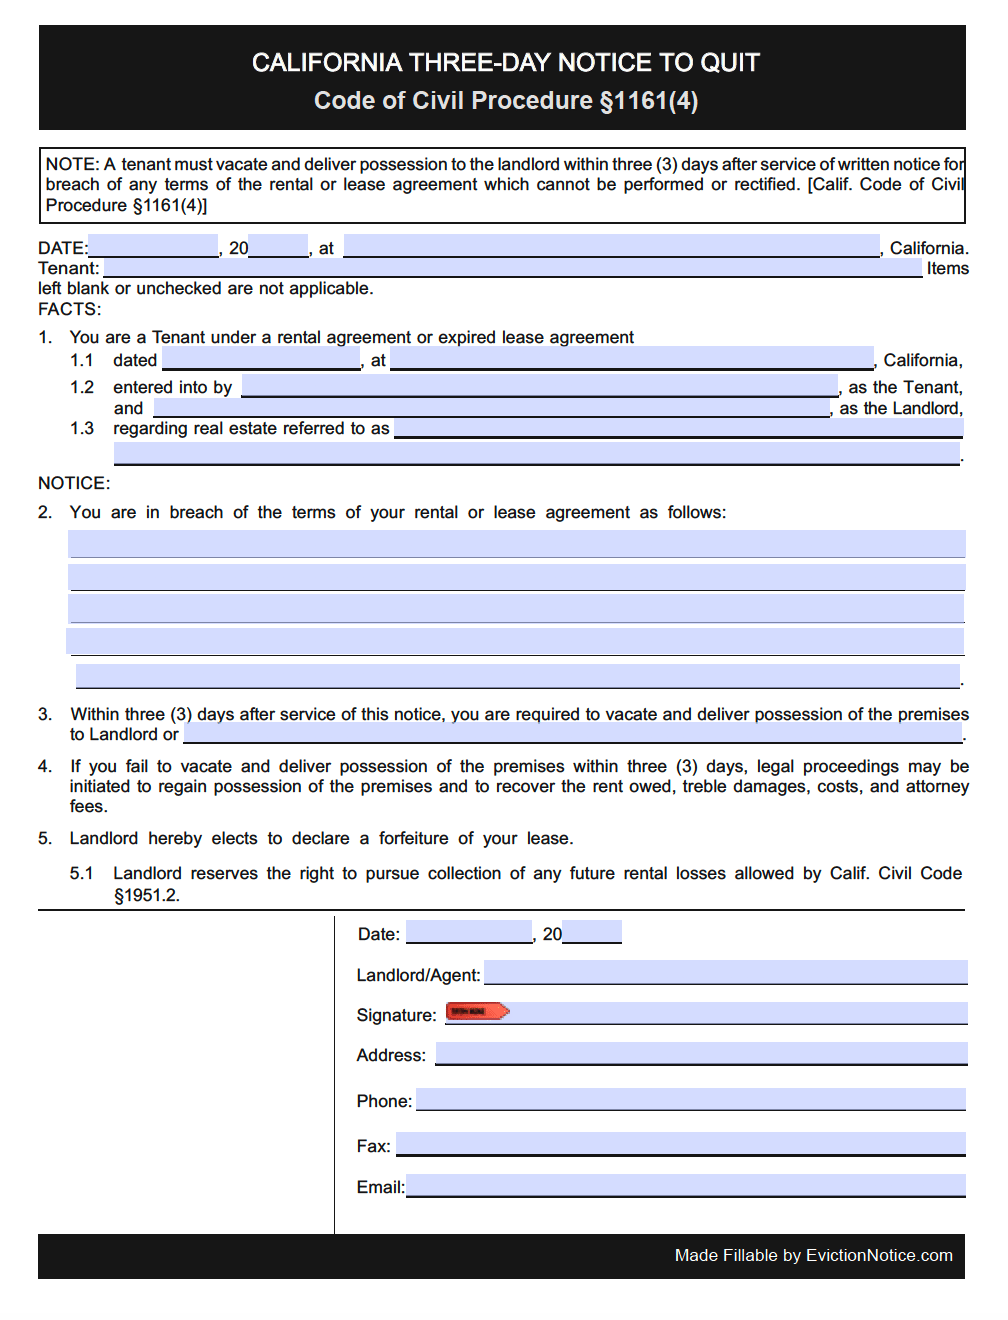 3 day notice to quit california pdf Free California 3 Day Notice to Quit   Illegal Activity   PDF